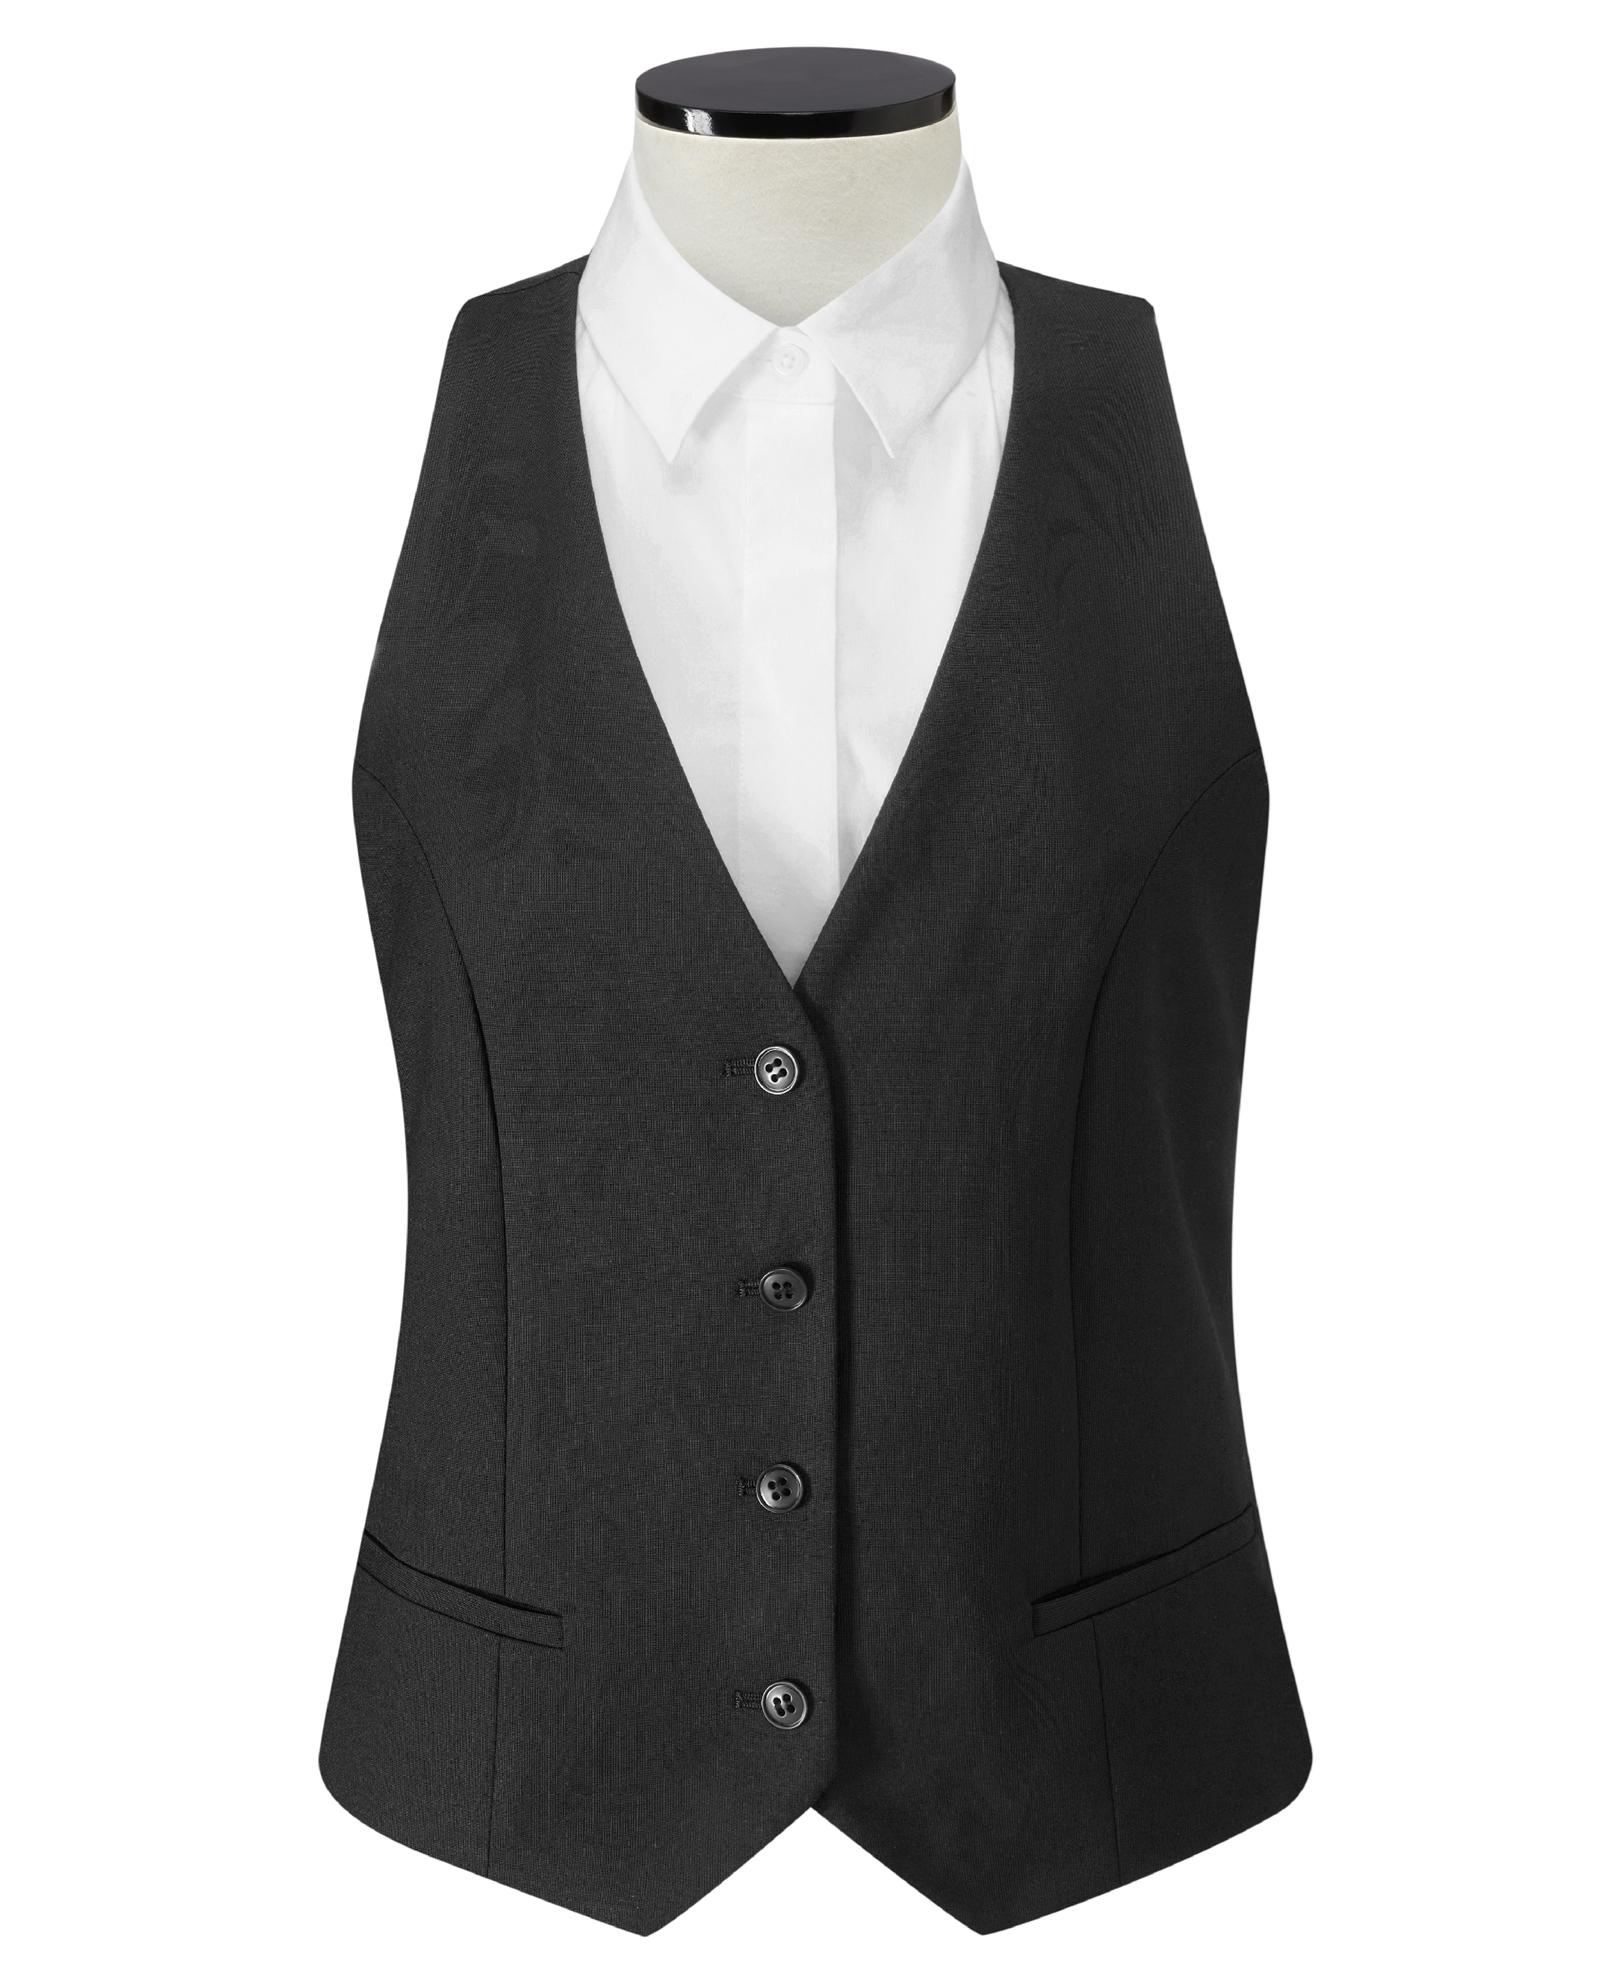 Picture of Poplar Ladies Waistcoat - Black